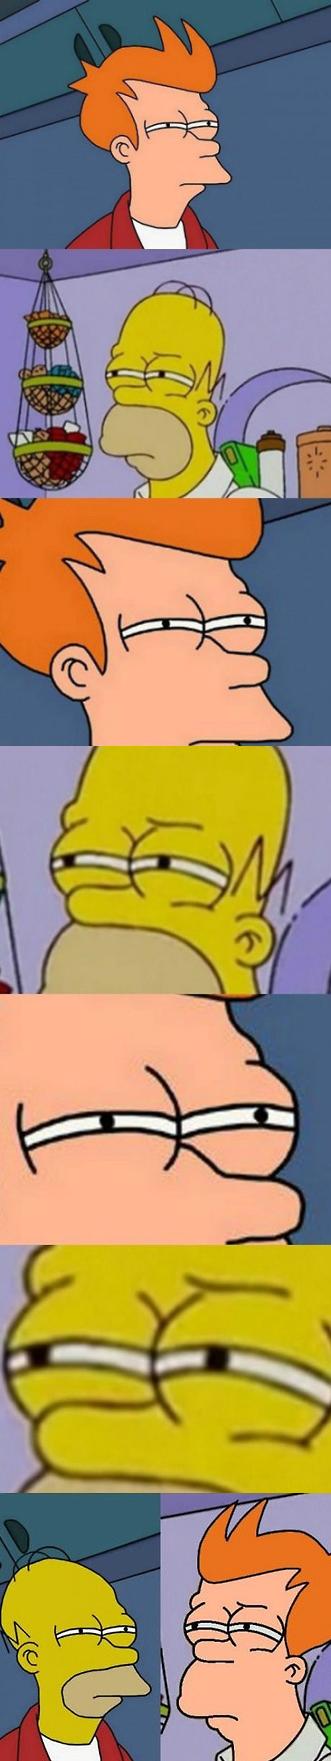 fry versus homer in a squinty eye off, face swap